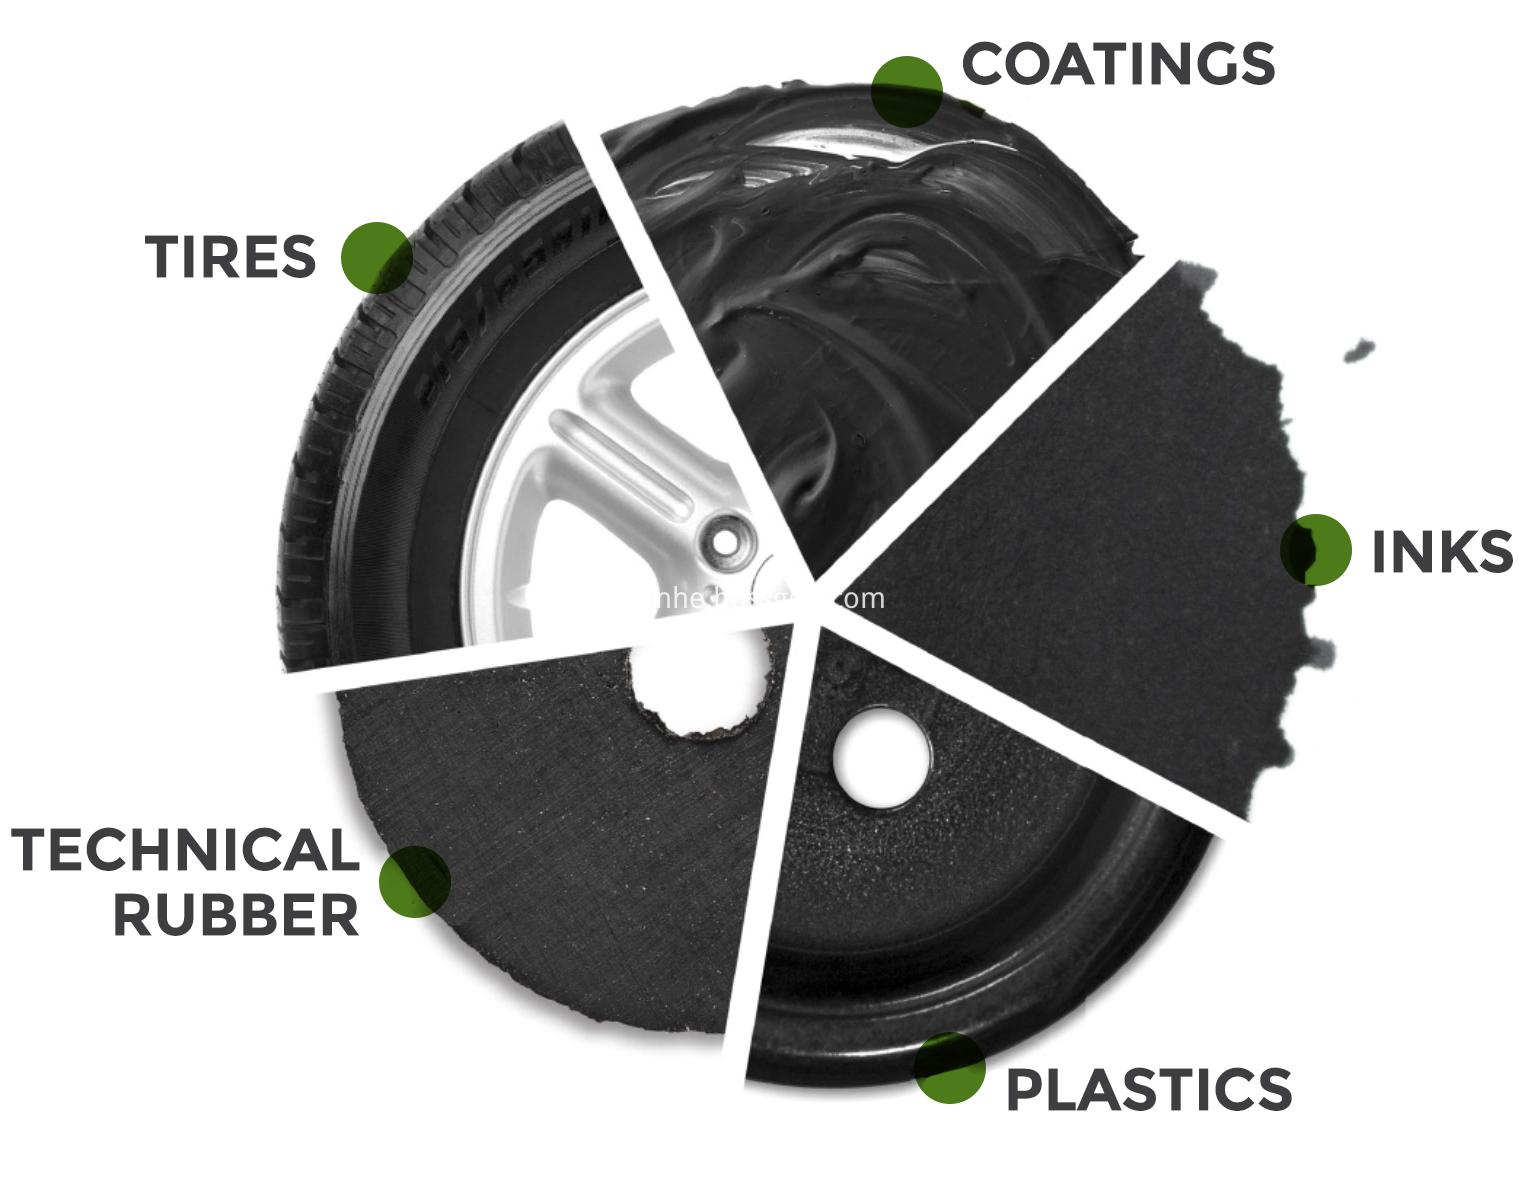 Pigment Carbon Black For Industrial Coating